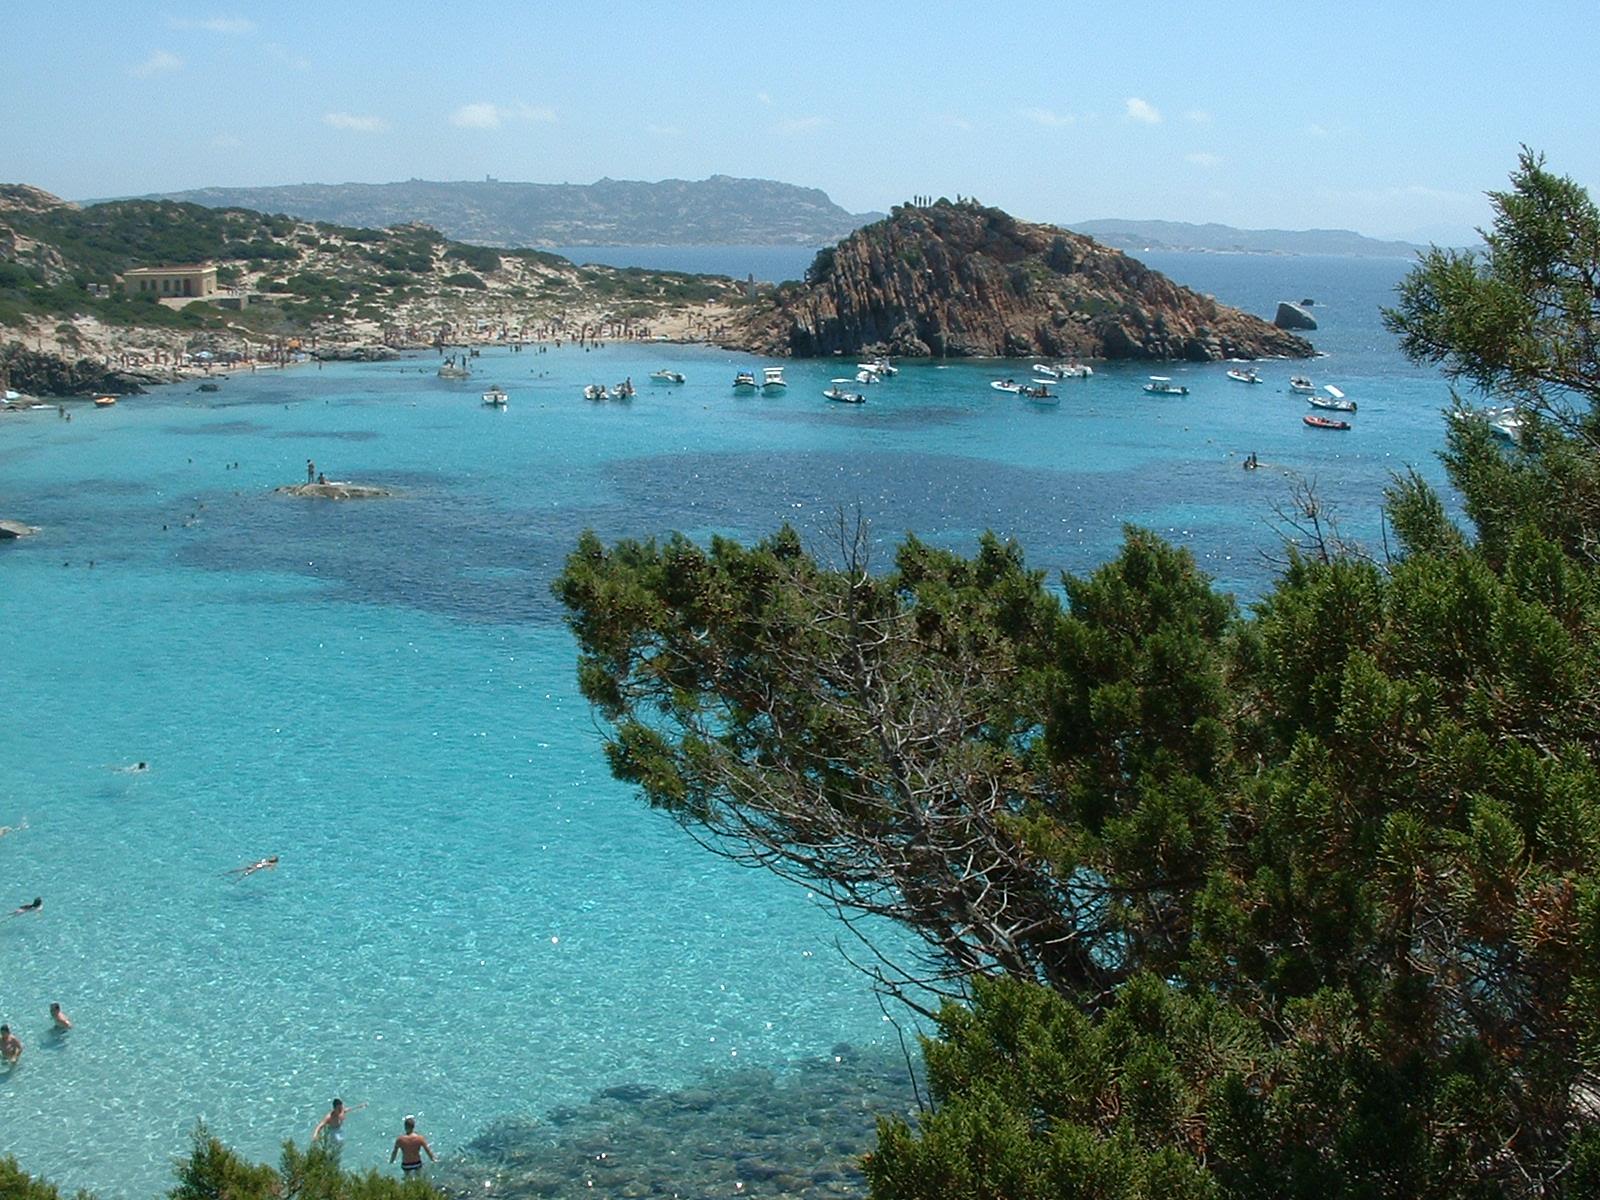 Vacanze bambini net gita in barca sardegna for Vacanze a novembre in italia